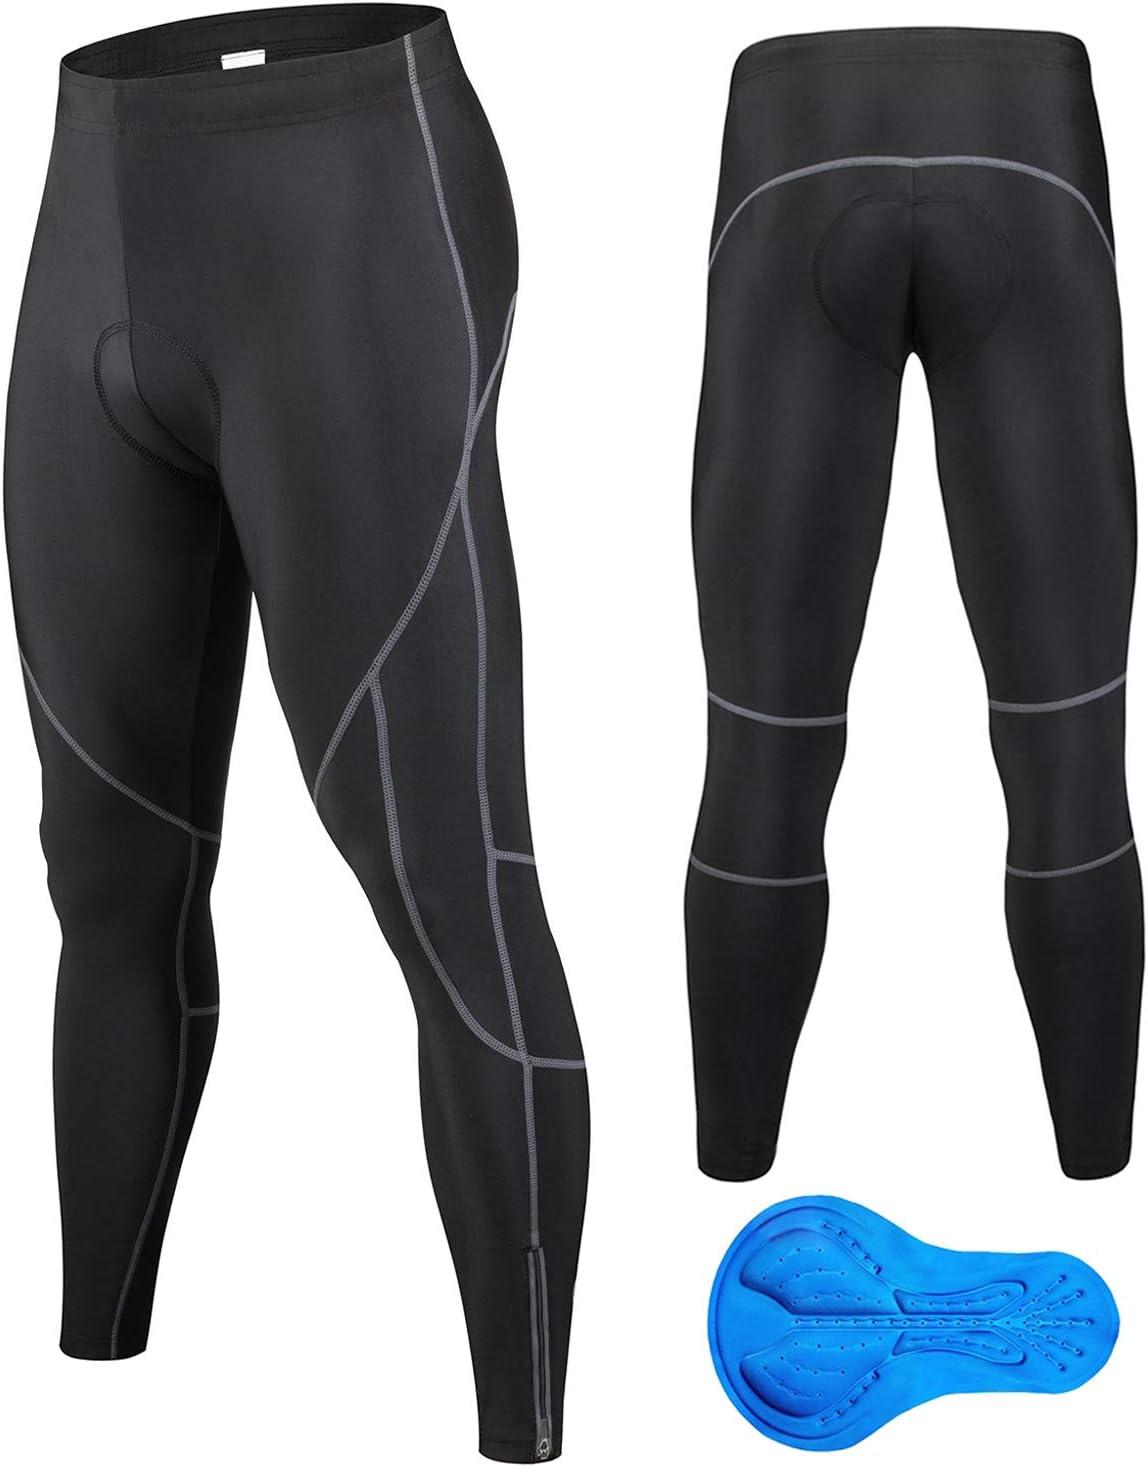 JEPOZRA Pantalones de ciclismo de invierno para hombre, largos con acolchado de gel 4D, para bicicleta de montaña, transpirables, de compresión, térmicos, pantalones deportivos